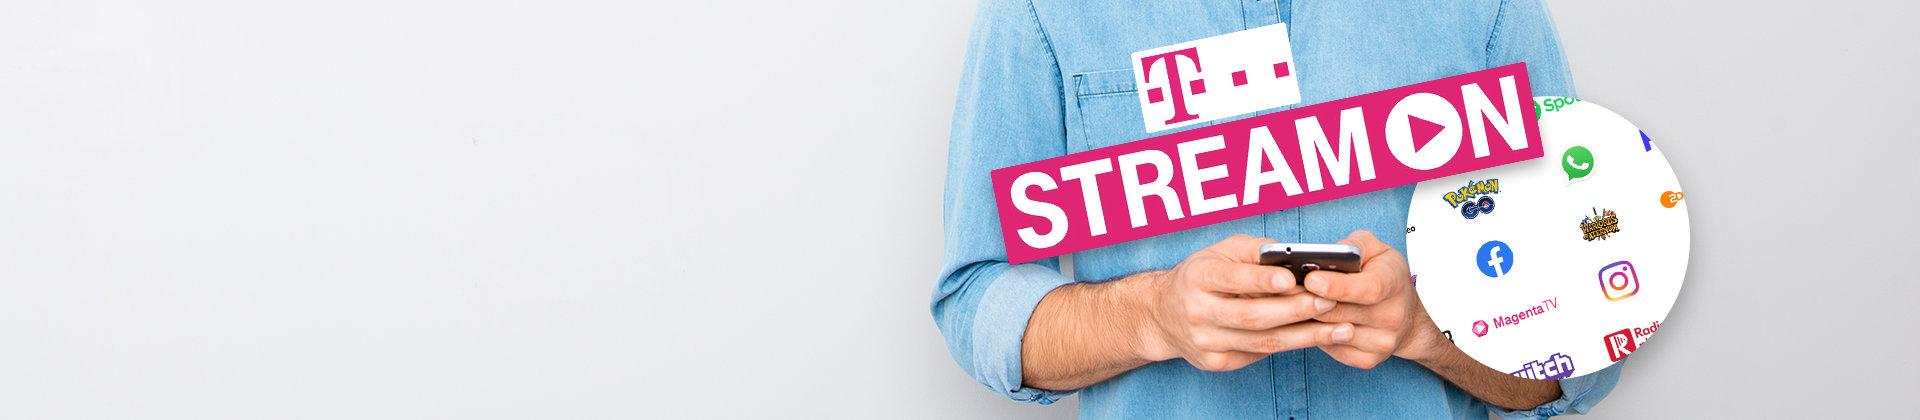 Telekom/Streamon